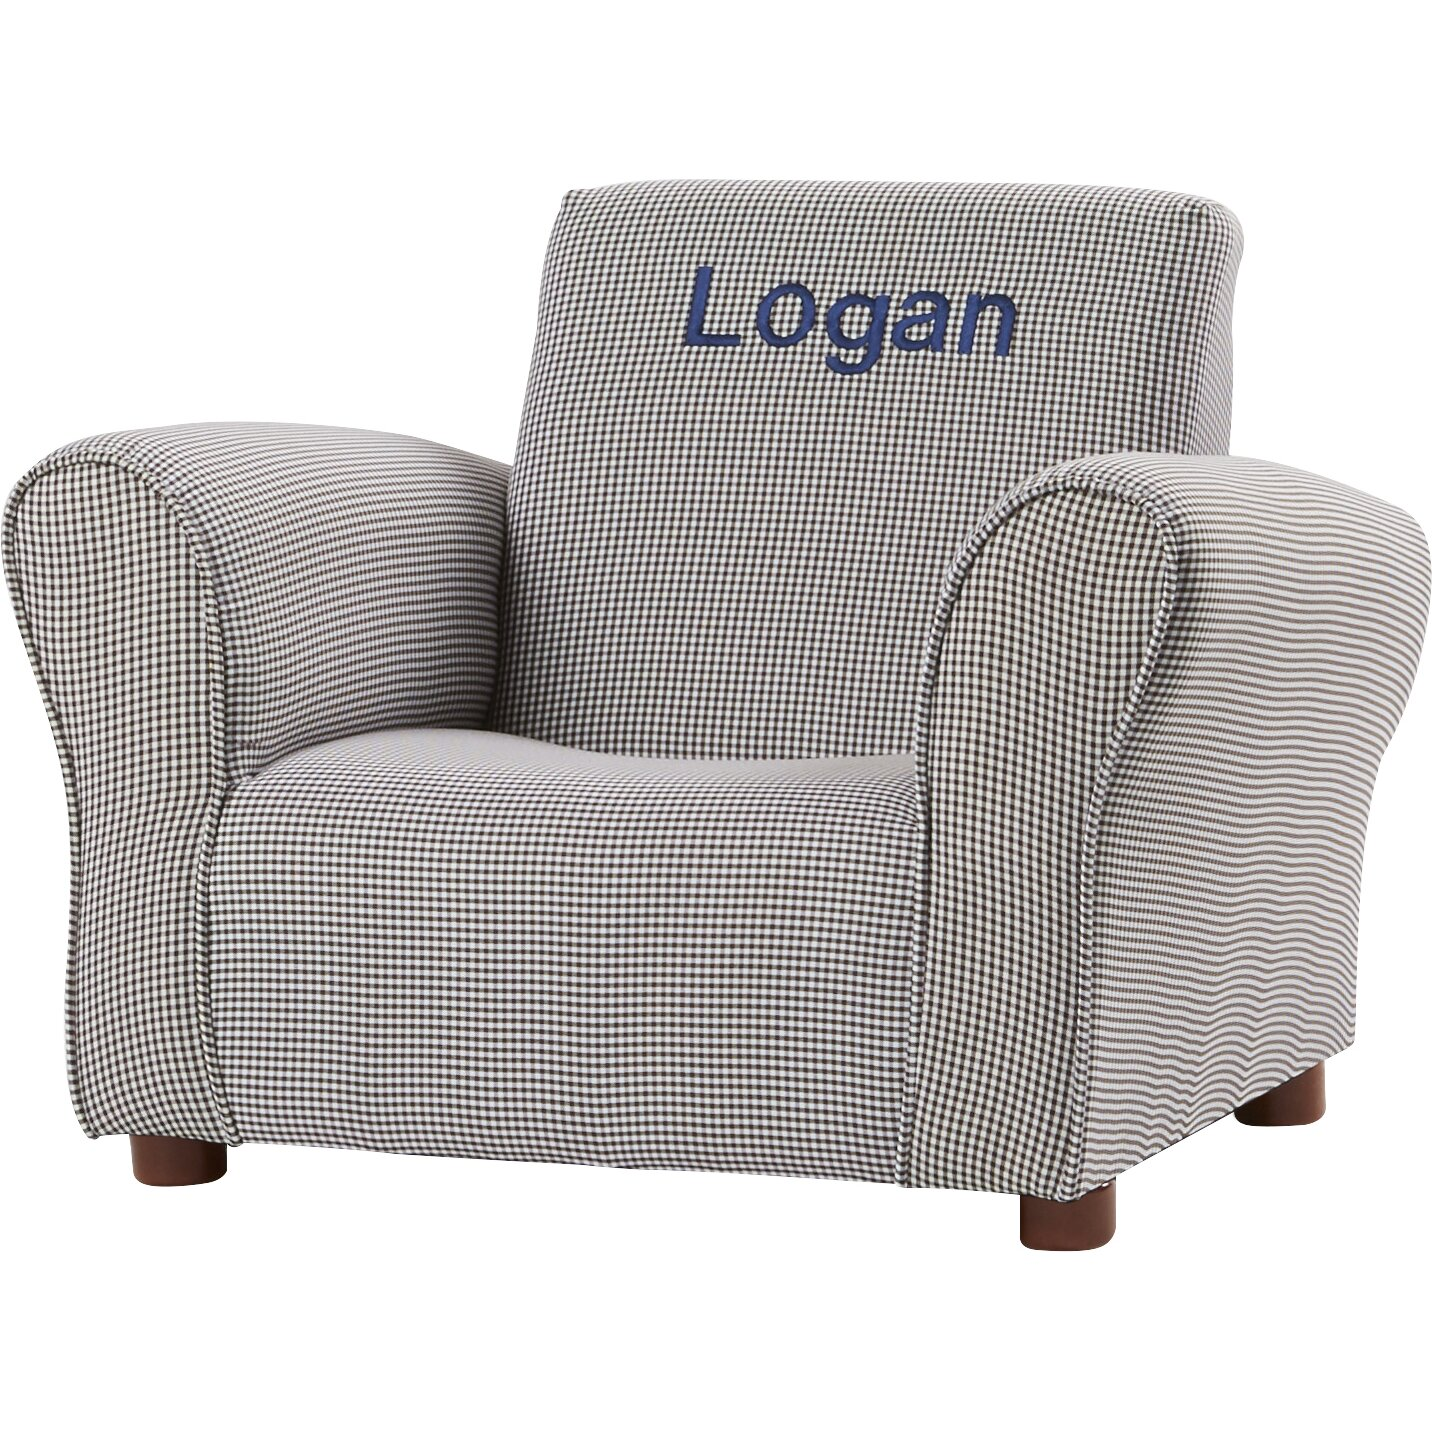 Keet Little Furniture Personalized Kids Club Chair